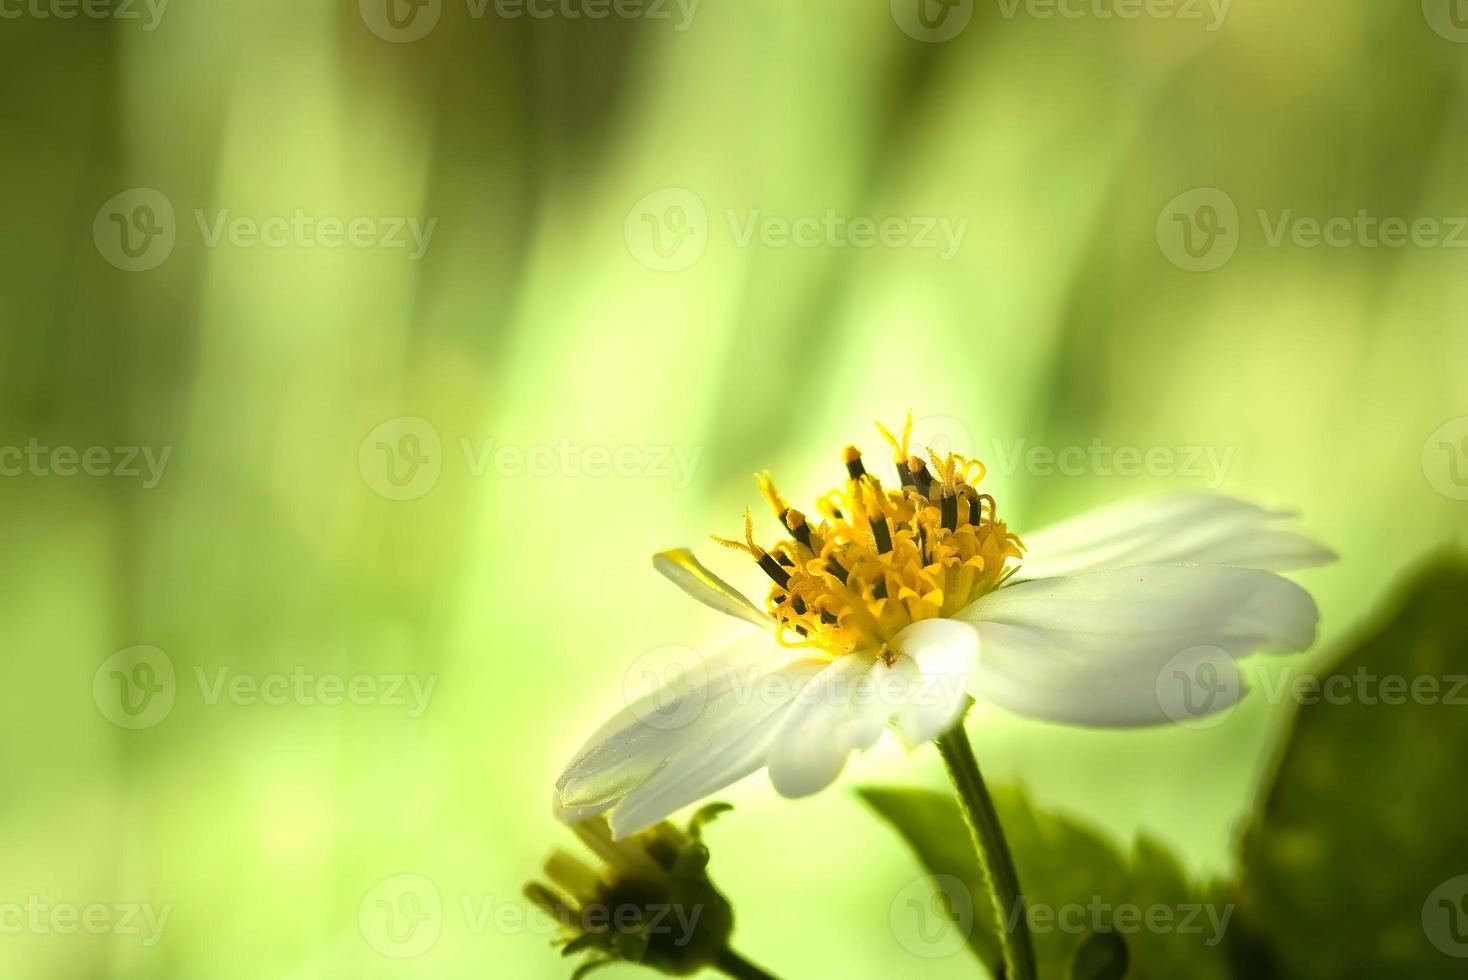 flor de cerezo, flores de sakura foto